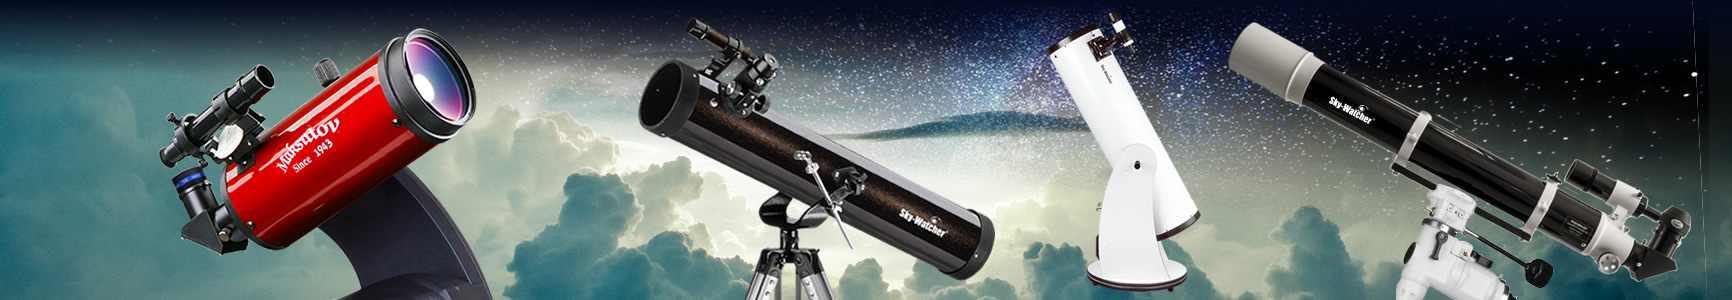 Telescoape astronomice SkyWacher